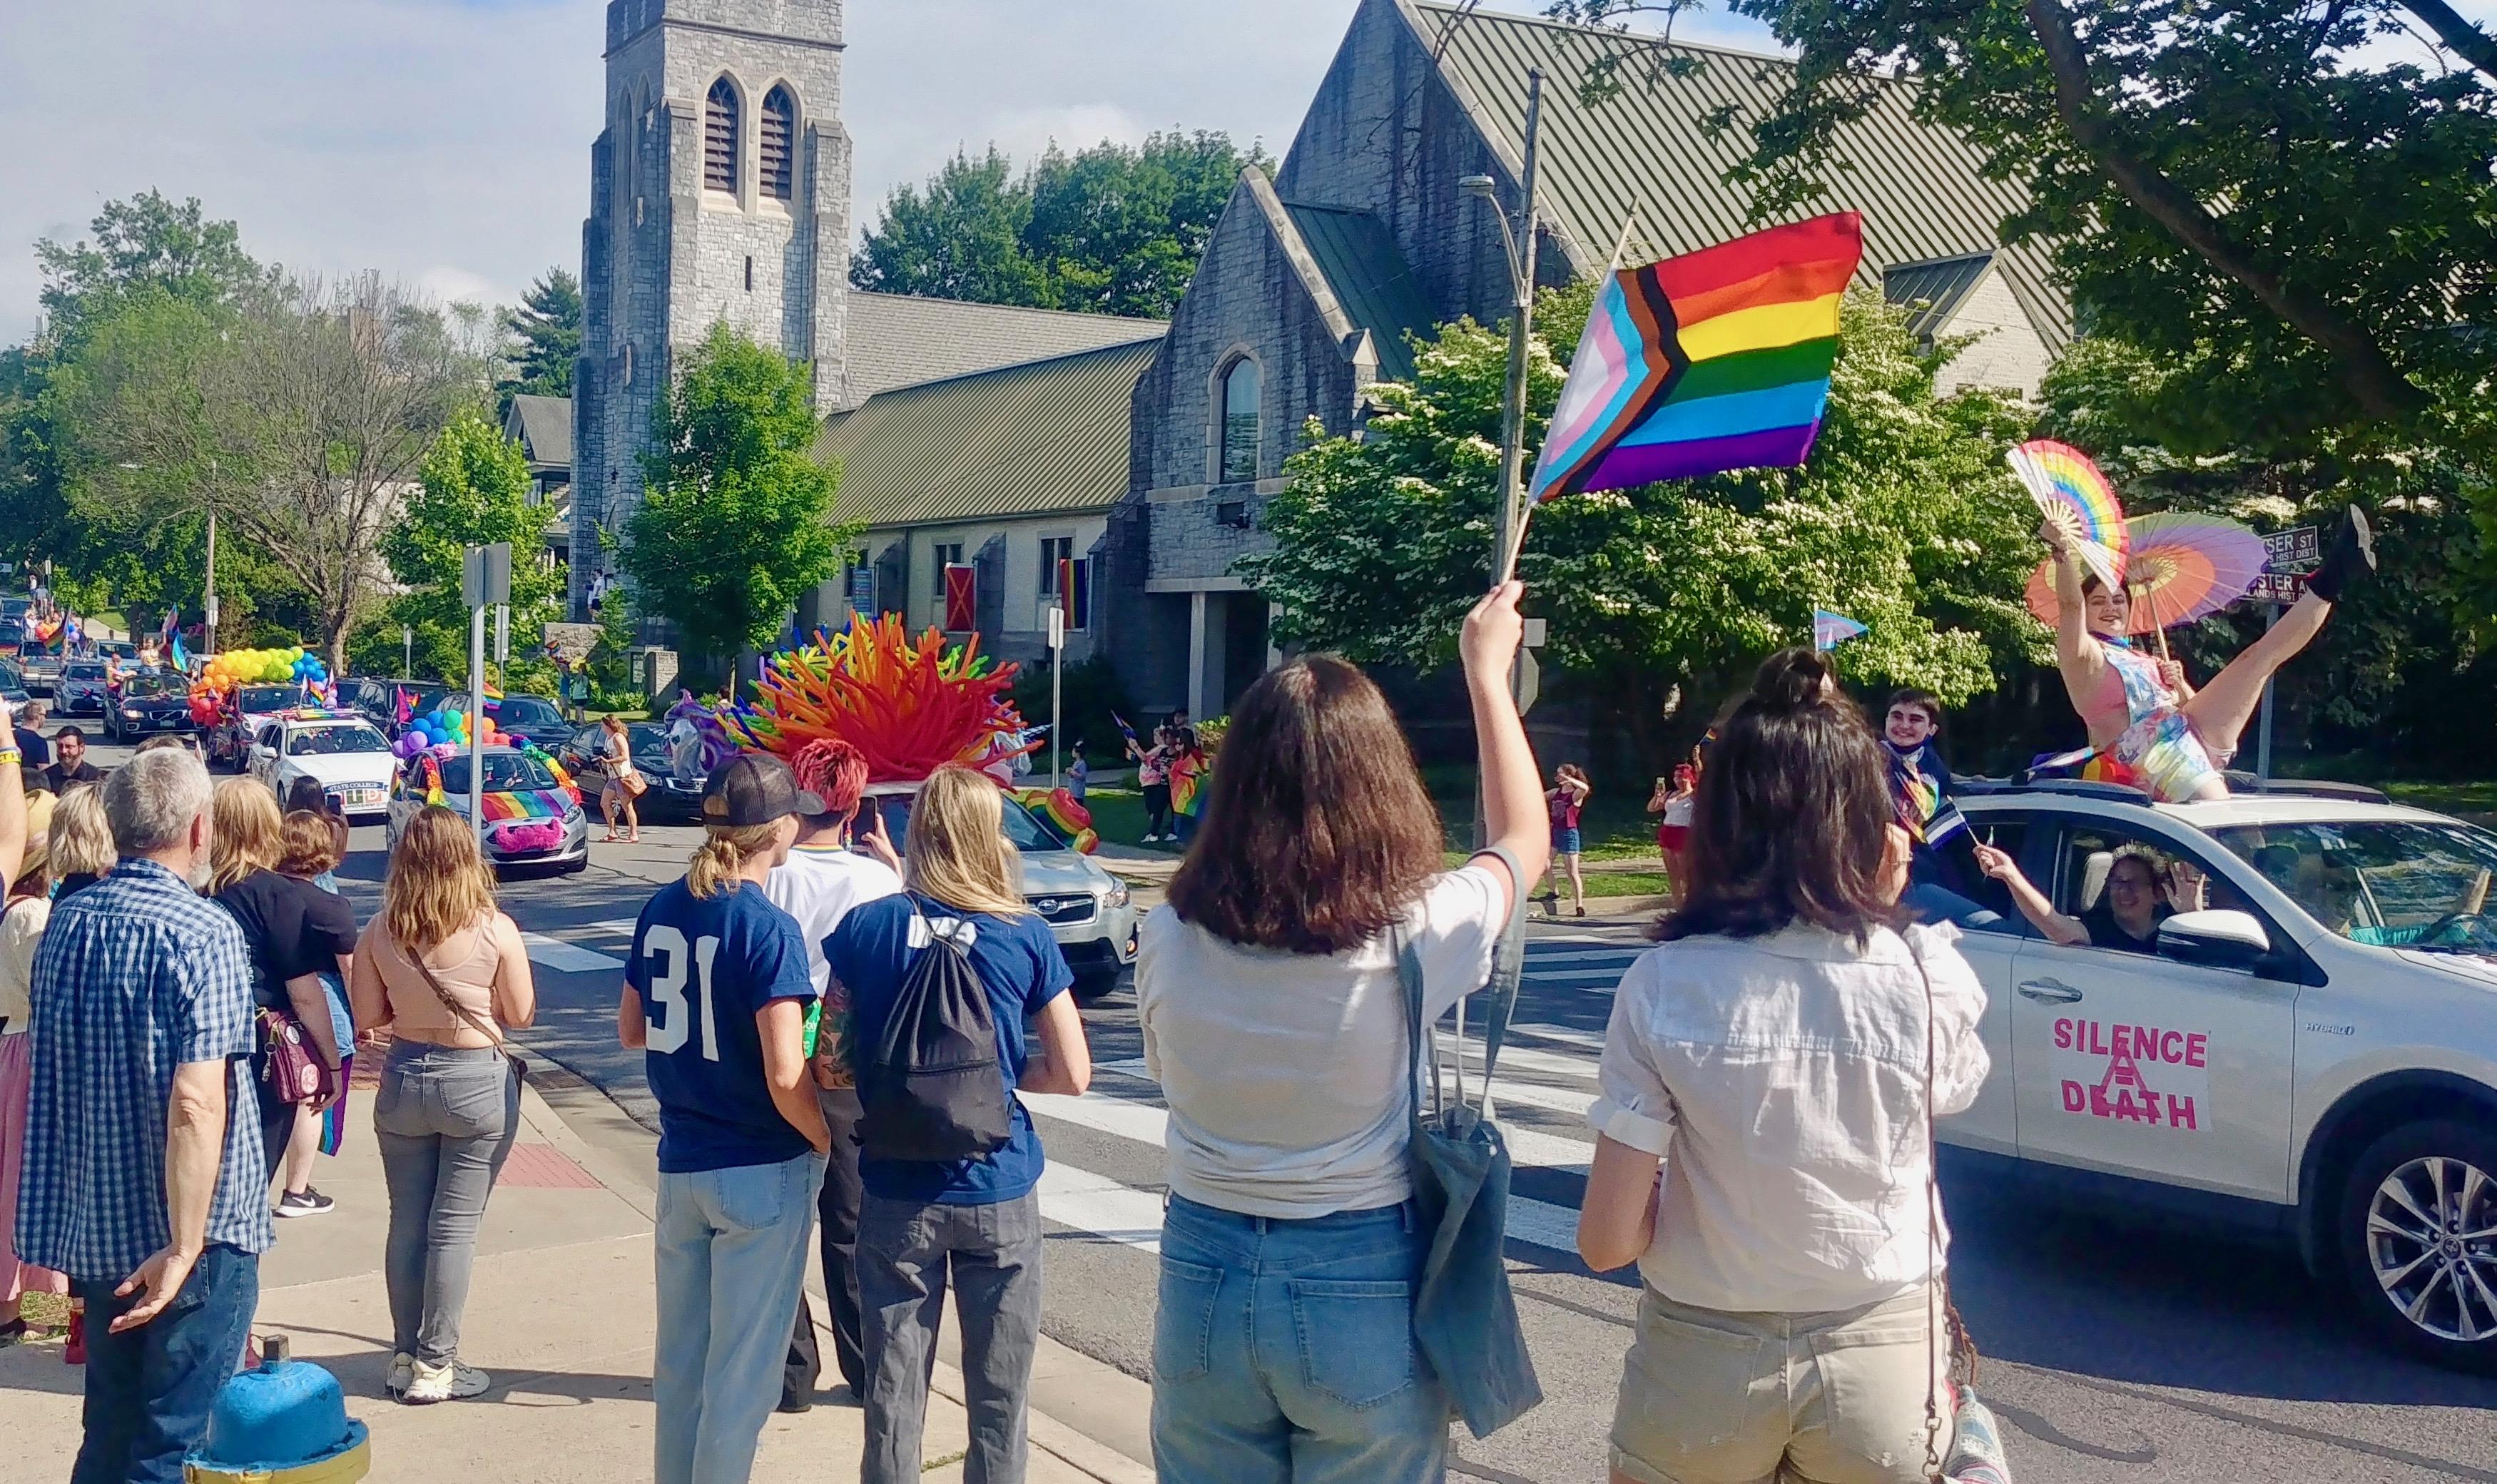 State College Celebrates Pride With Car Caravan